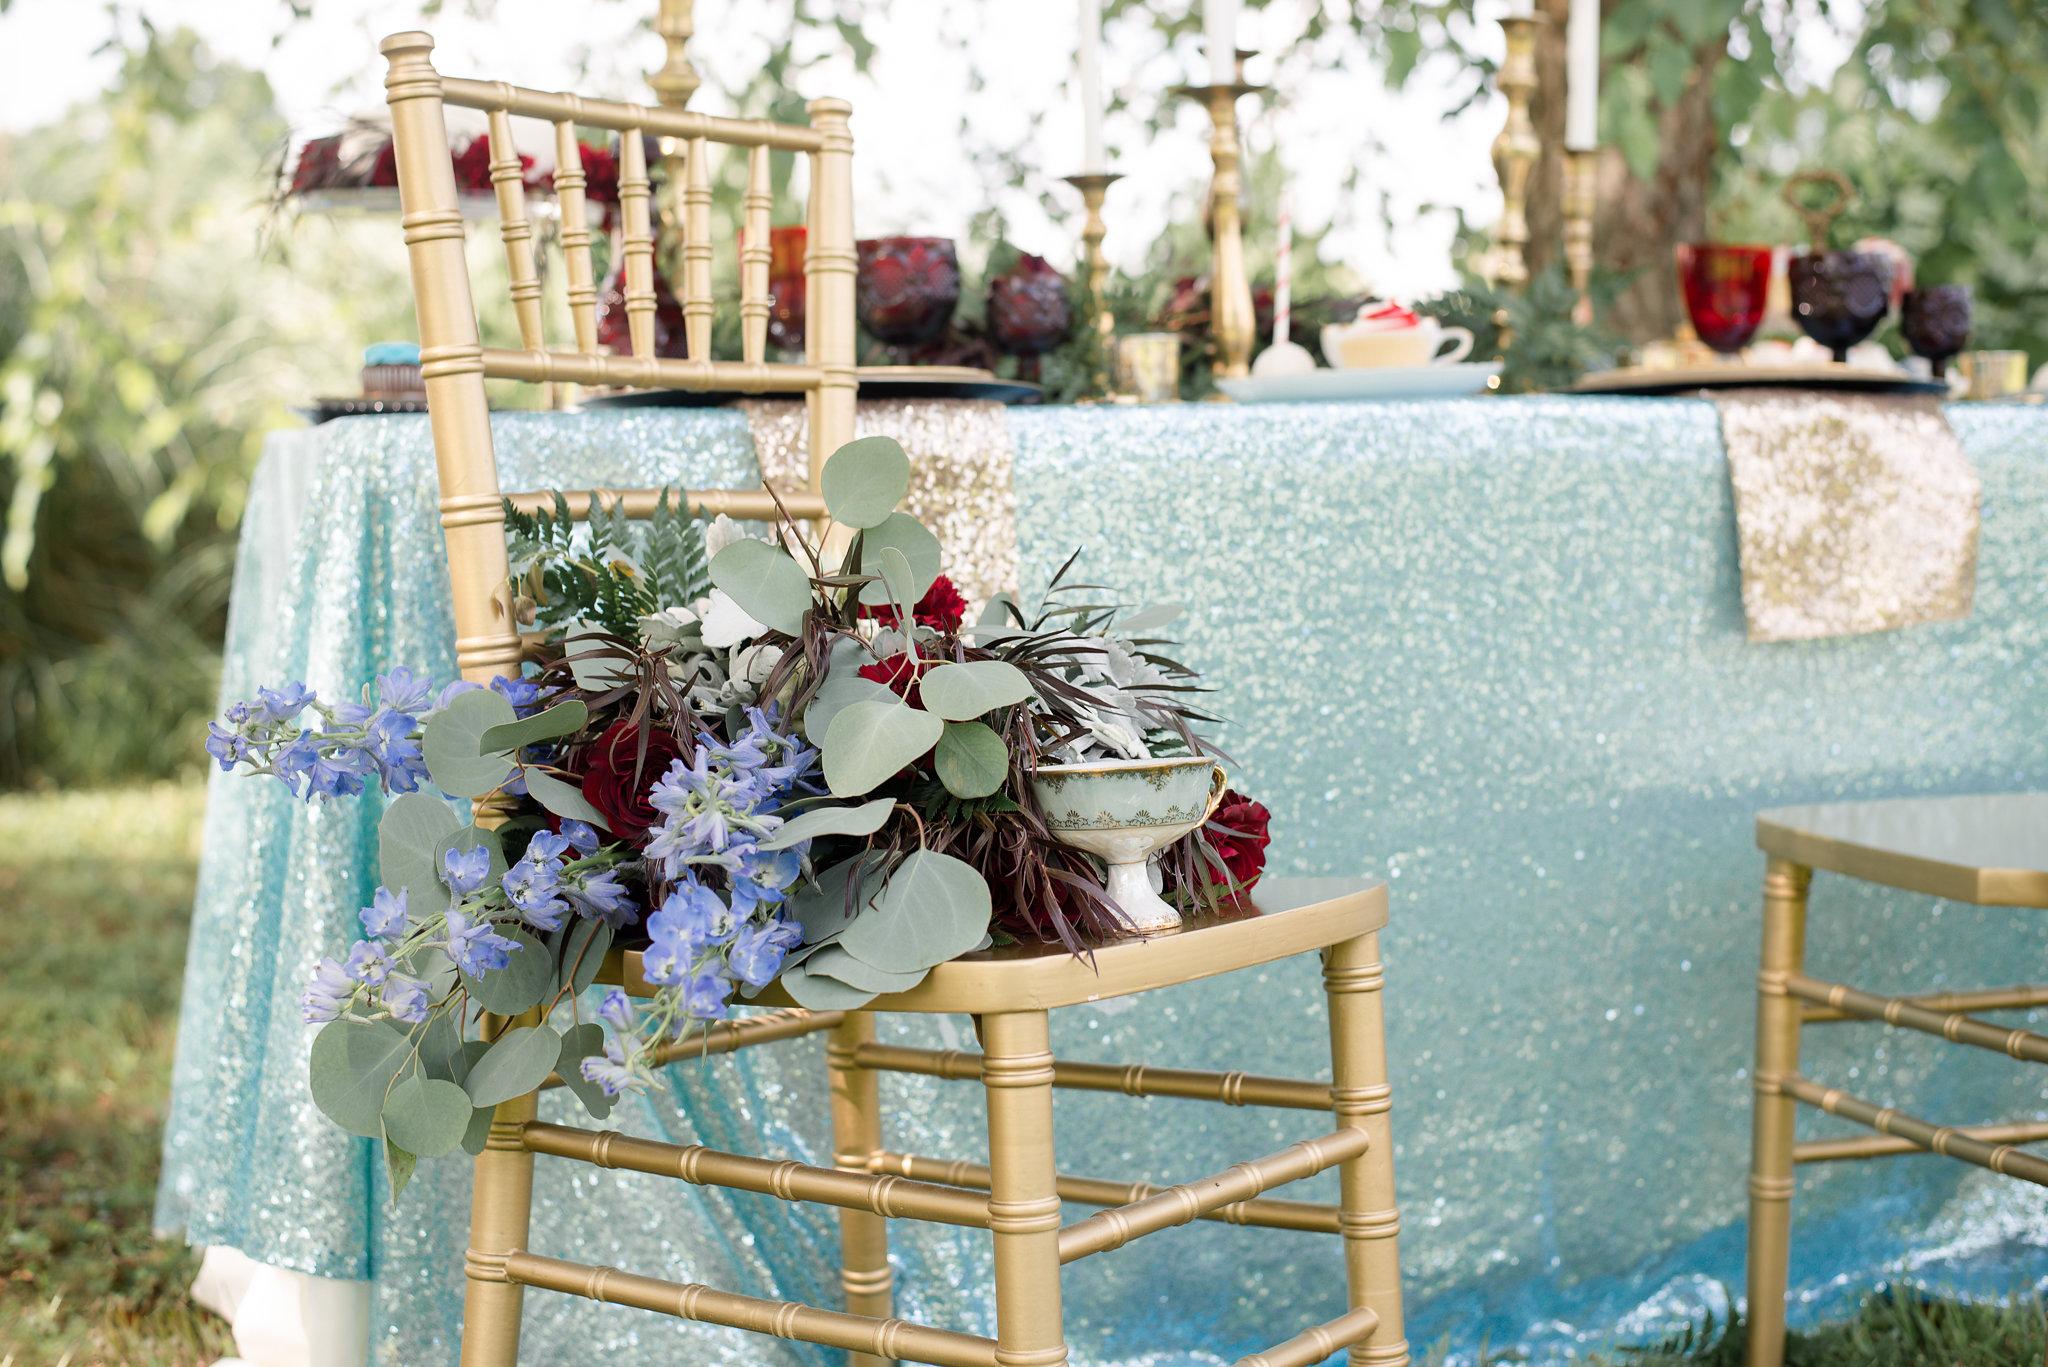 elizabeth-hayden-photography-wedding-arkansas-6145.jpg